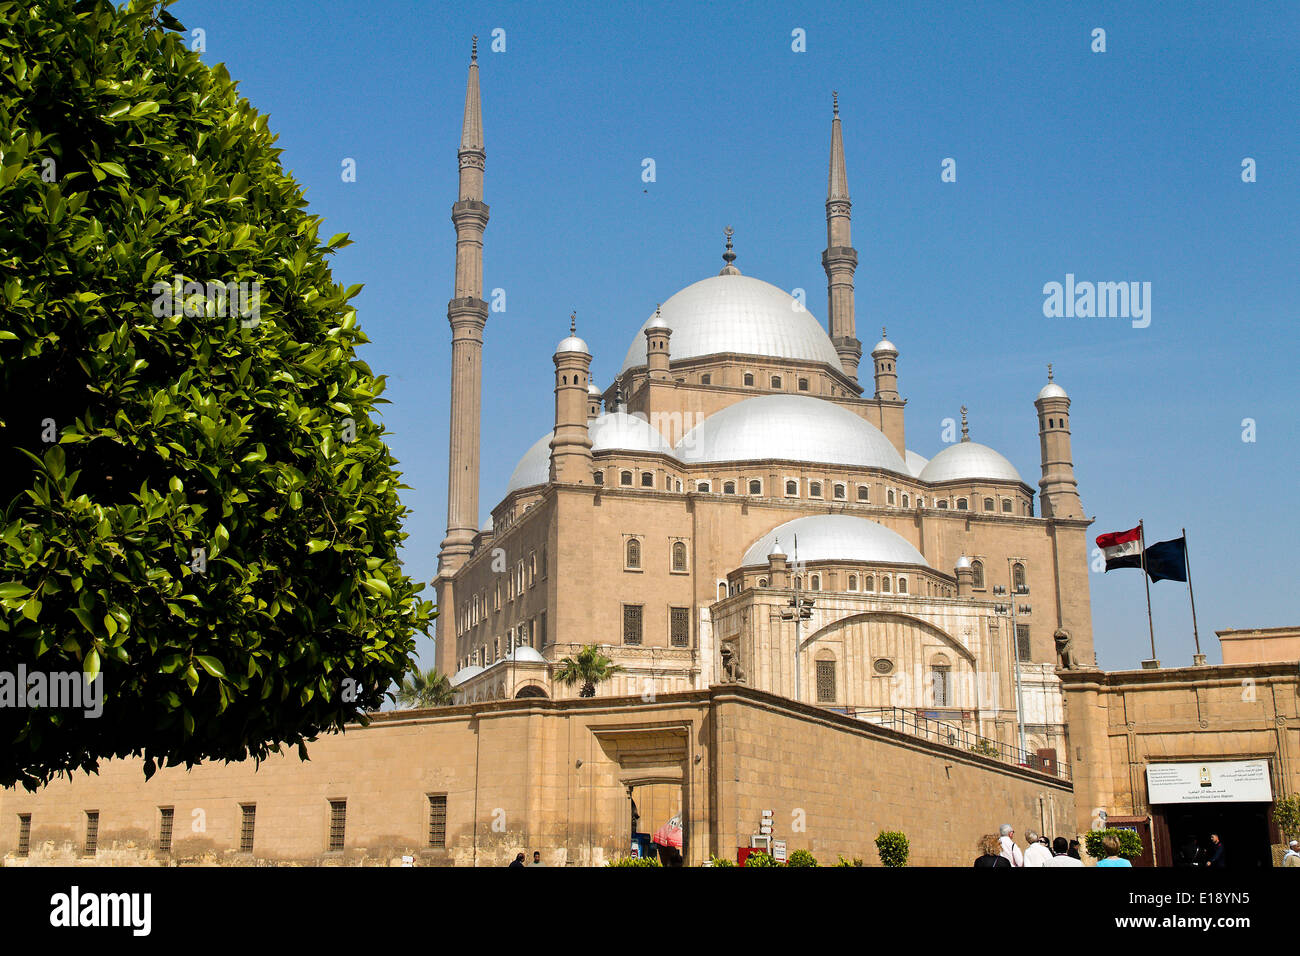 ƒgypten, Kairo. Mohammed Ali Moschee. Alabsater-Moschee. Aussen. Stock Photo